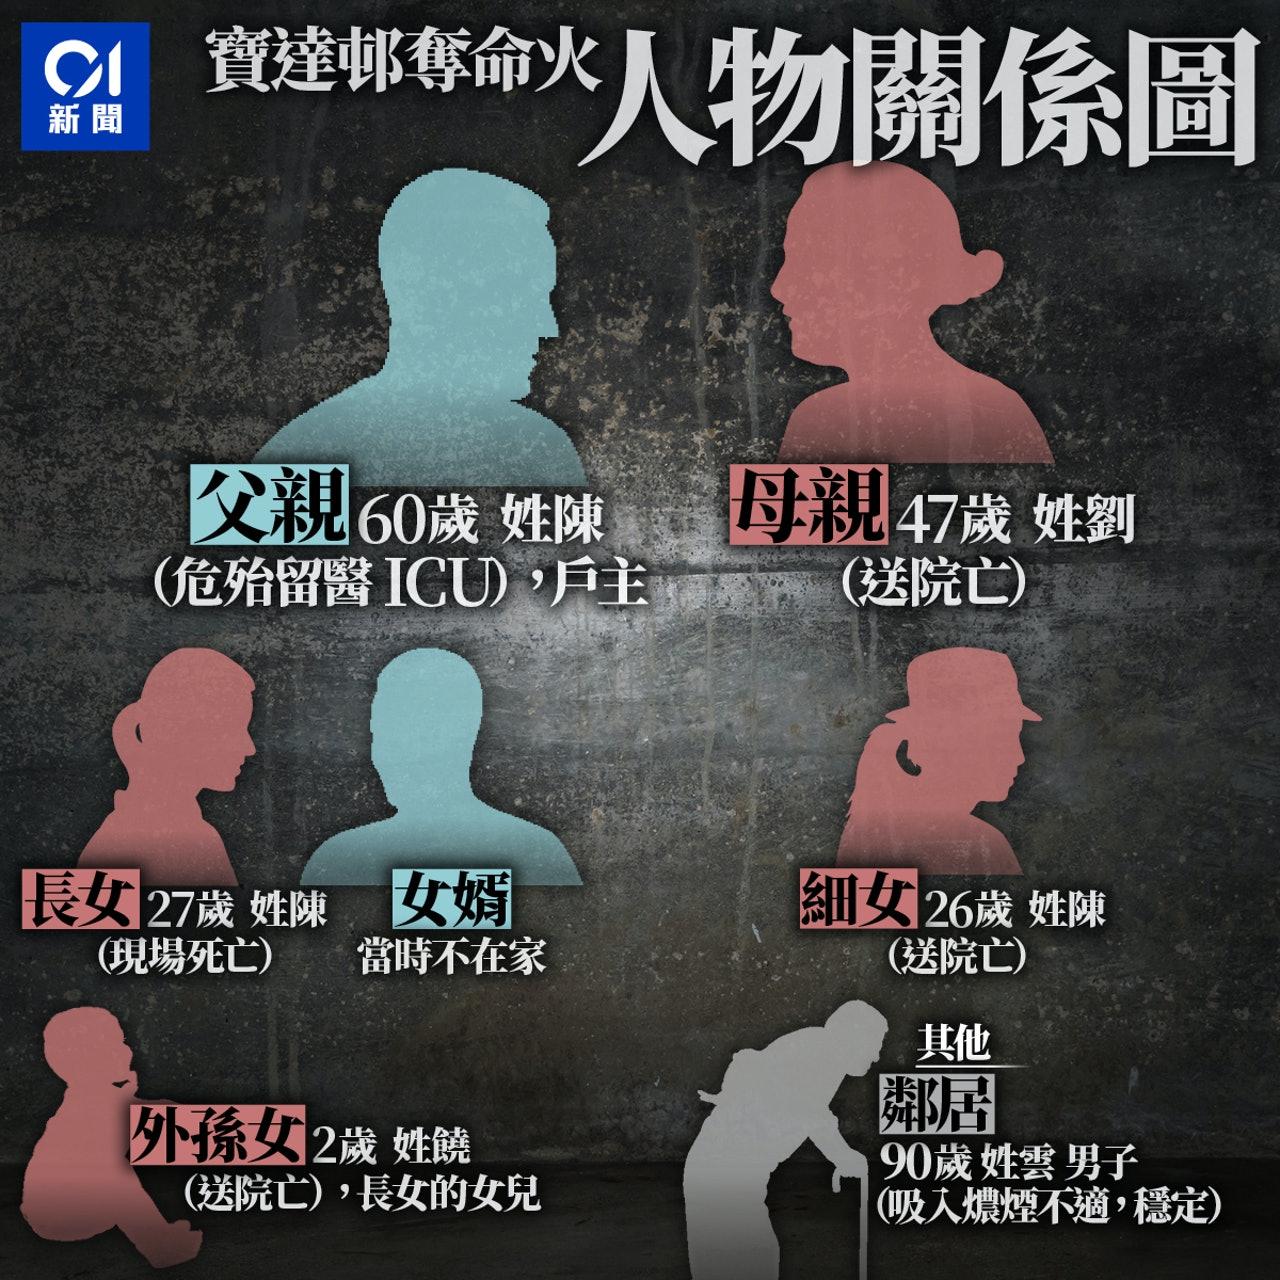 https://cdn.hk01.com/di/media/images/dw/20210416/459814120972095488910378.jpeg/p_k012C2GG_JMMa0PCr0CaHRTEBjetBcBg1QDAYNUAw?v=w1280